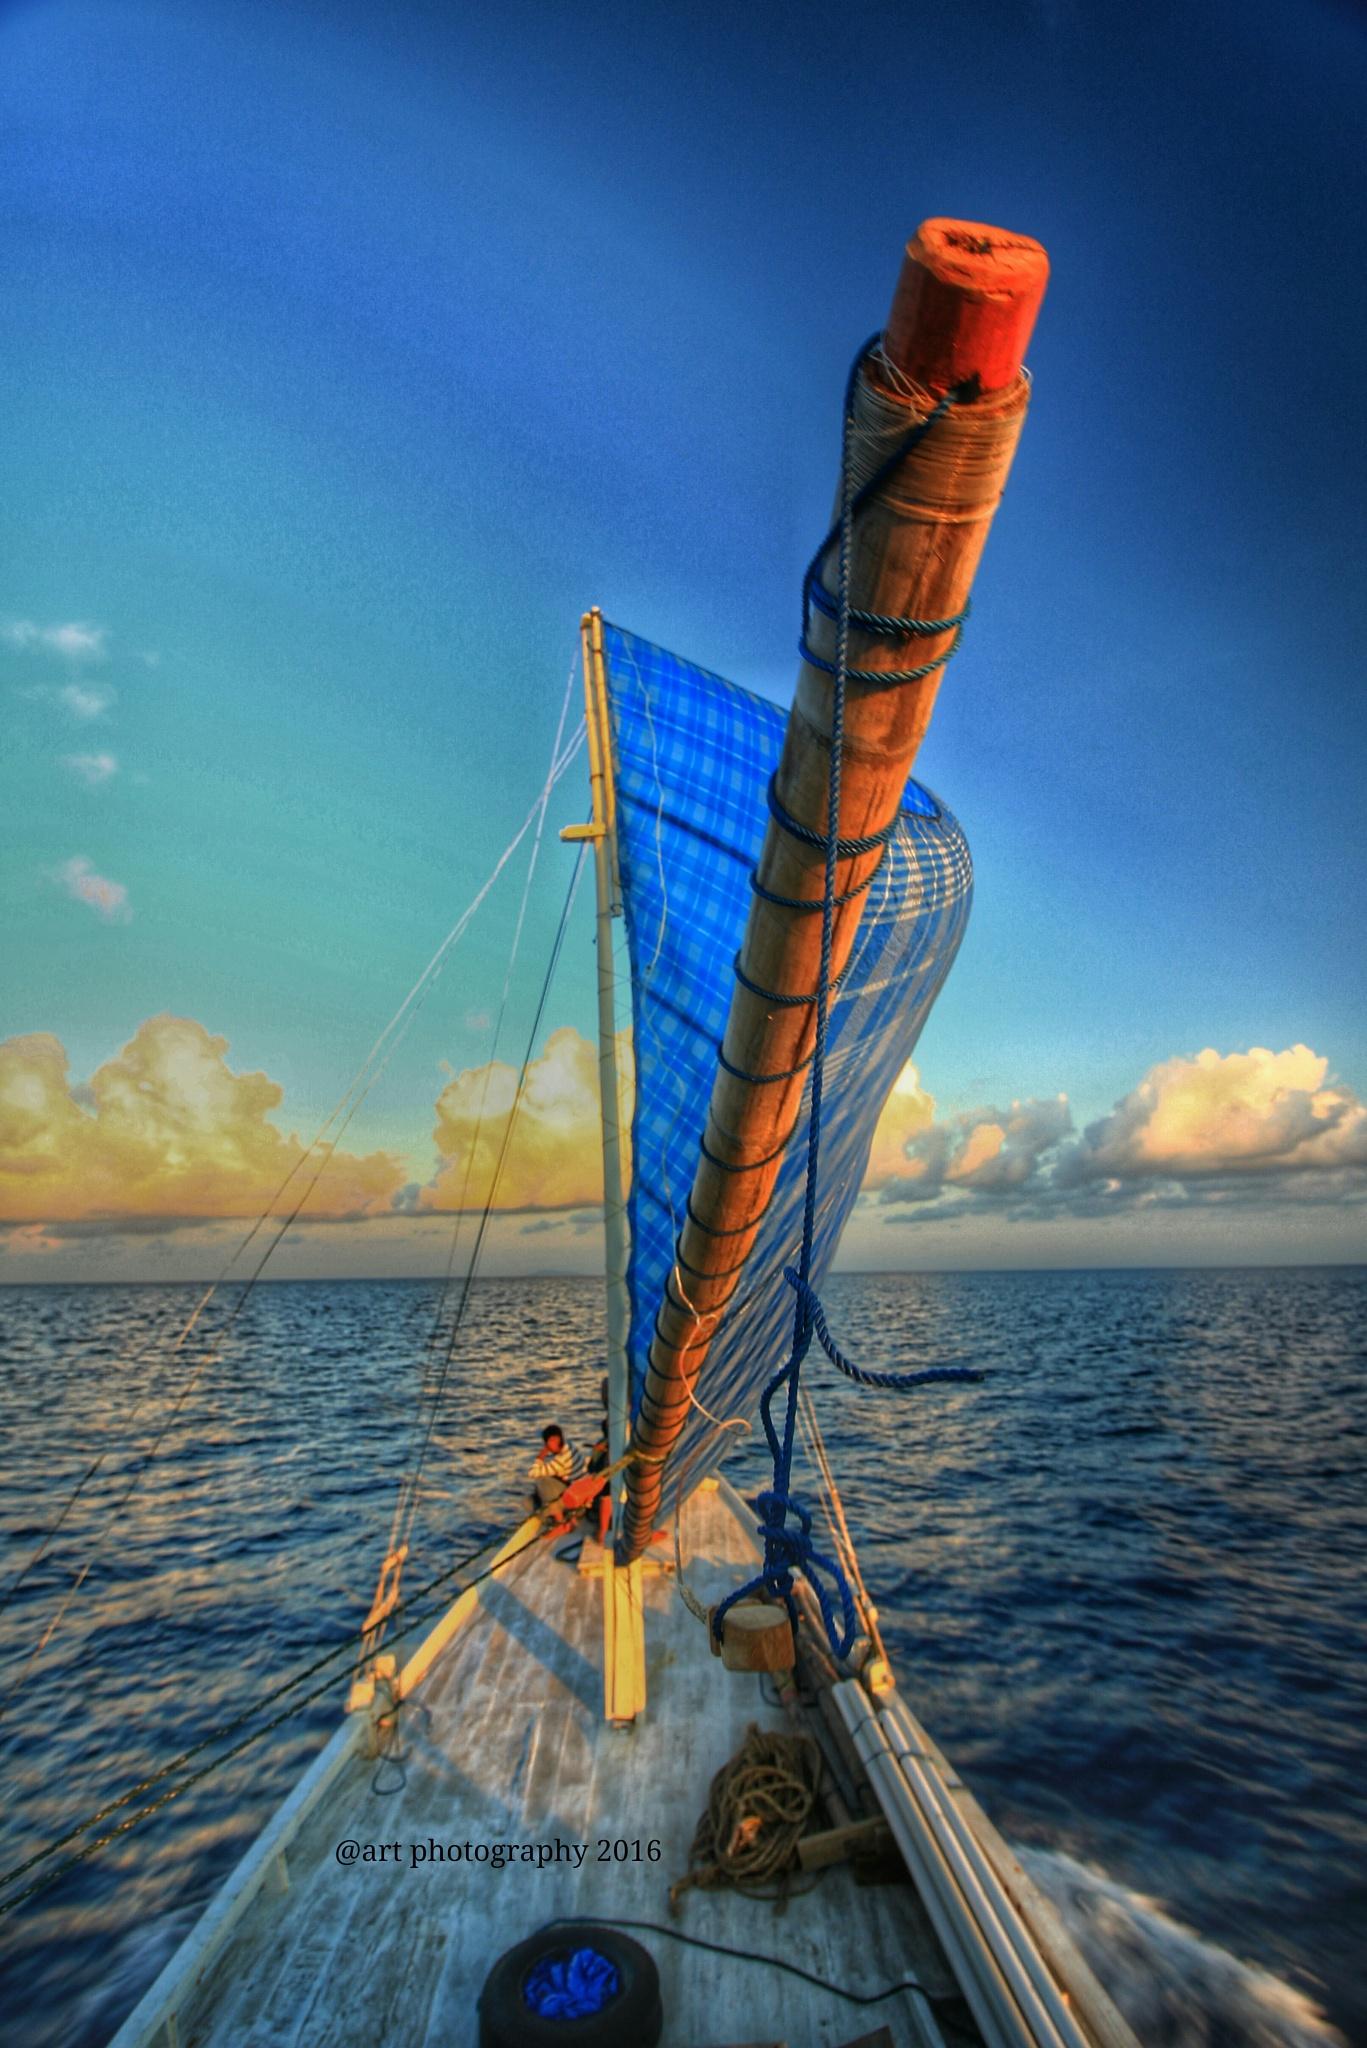 selayar island by hasrulibnuamri